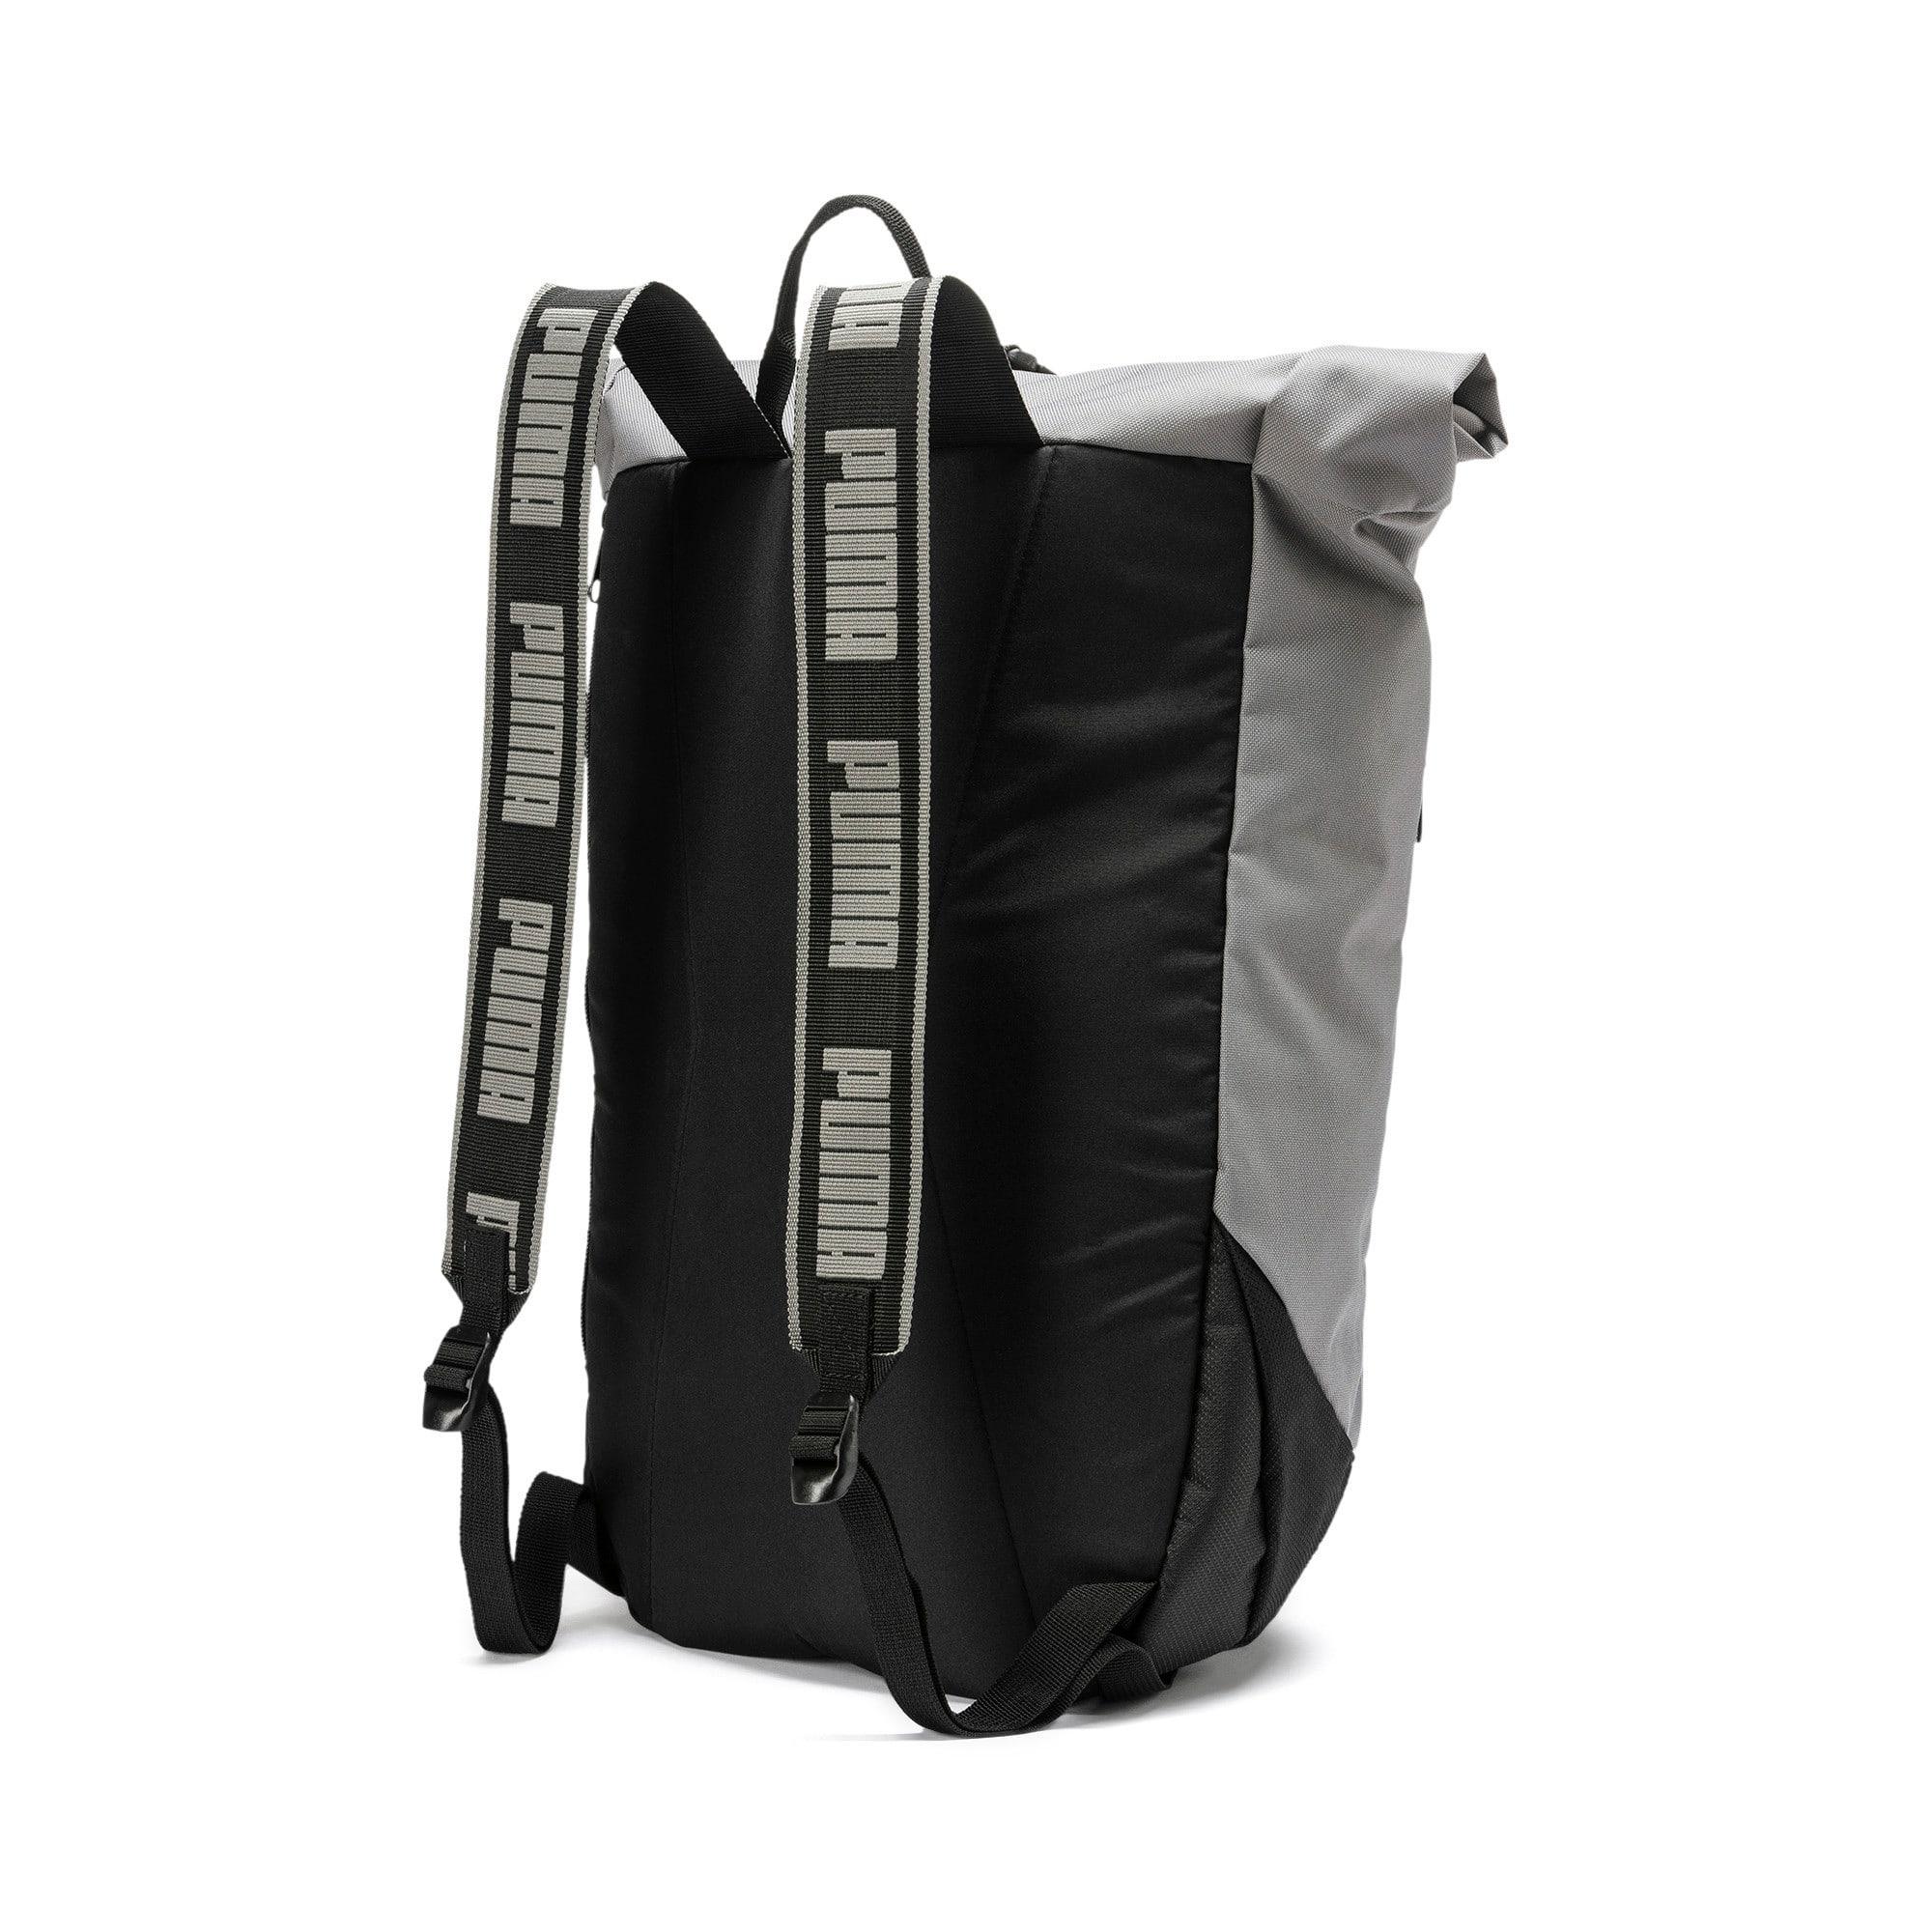 Thumbnail 2 of Sole Backpack, CASTLEROCK, medium